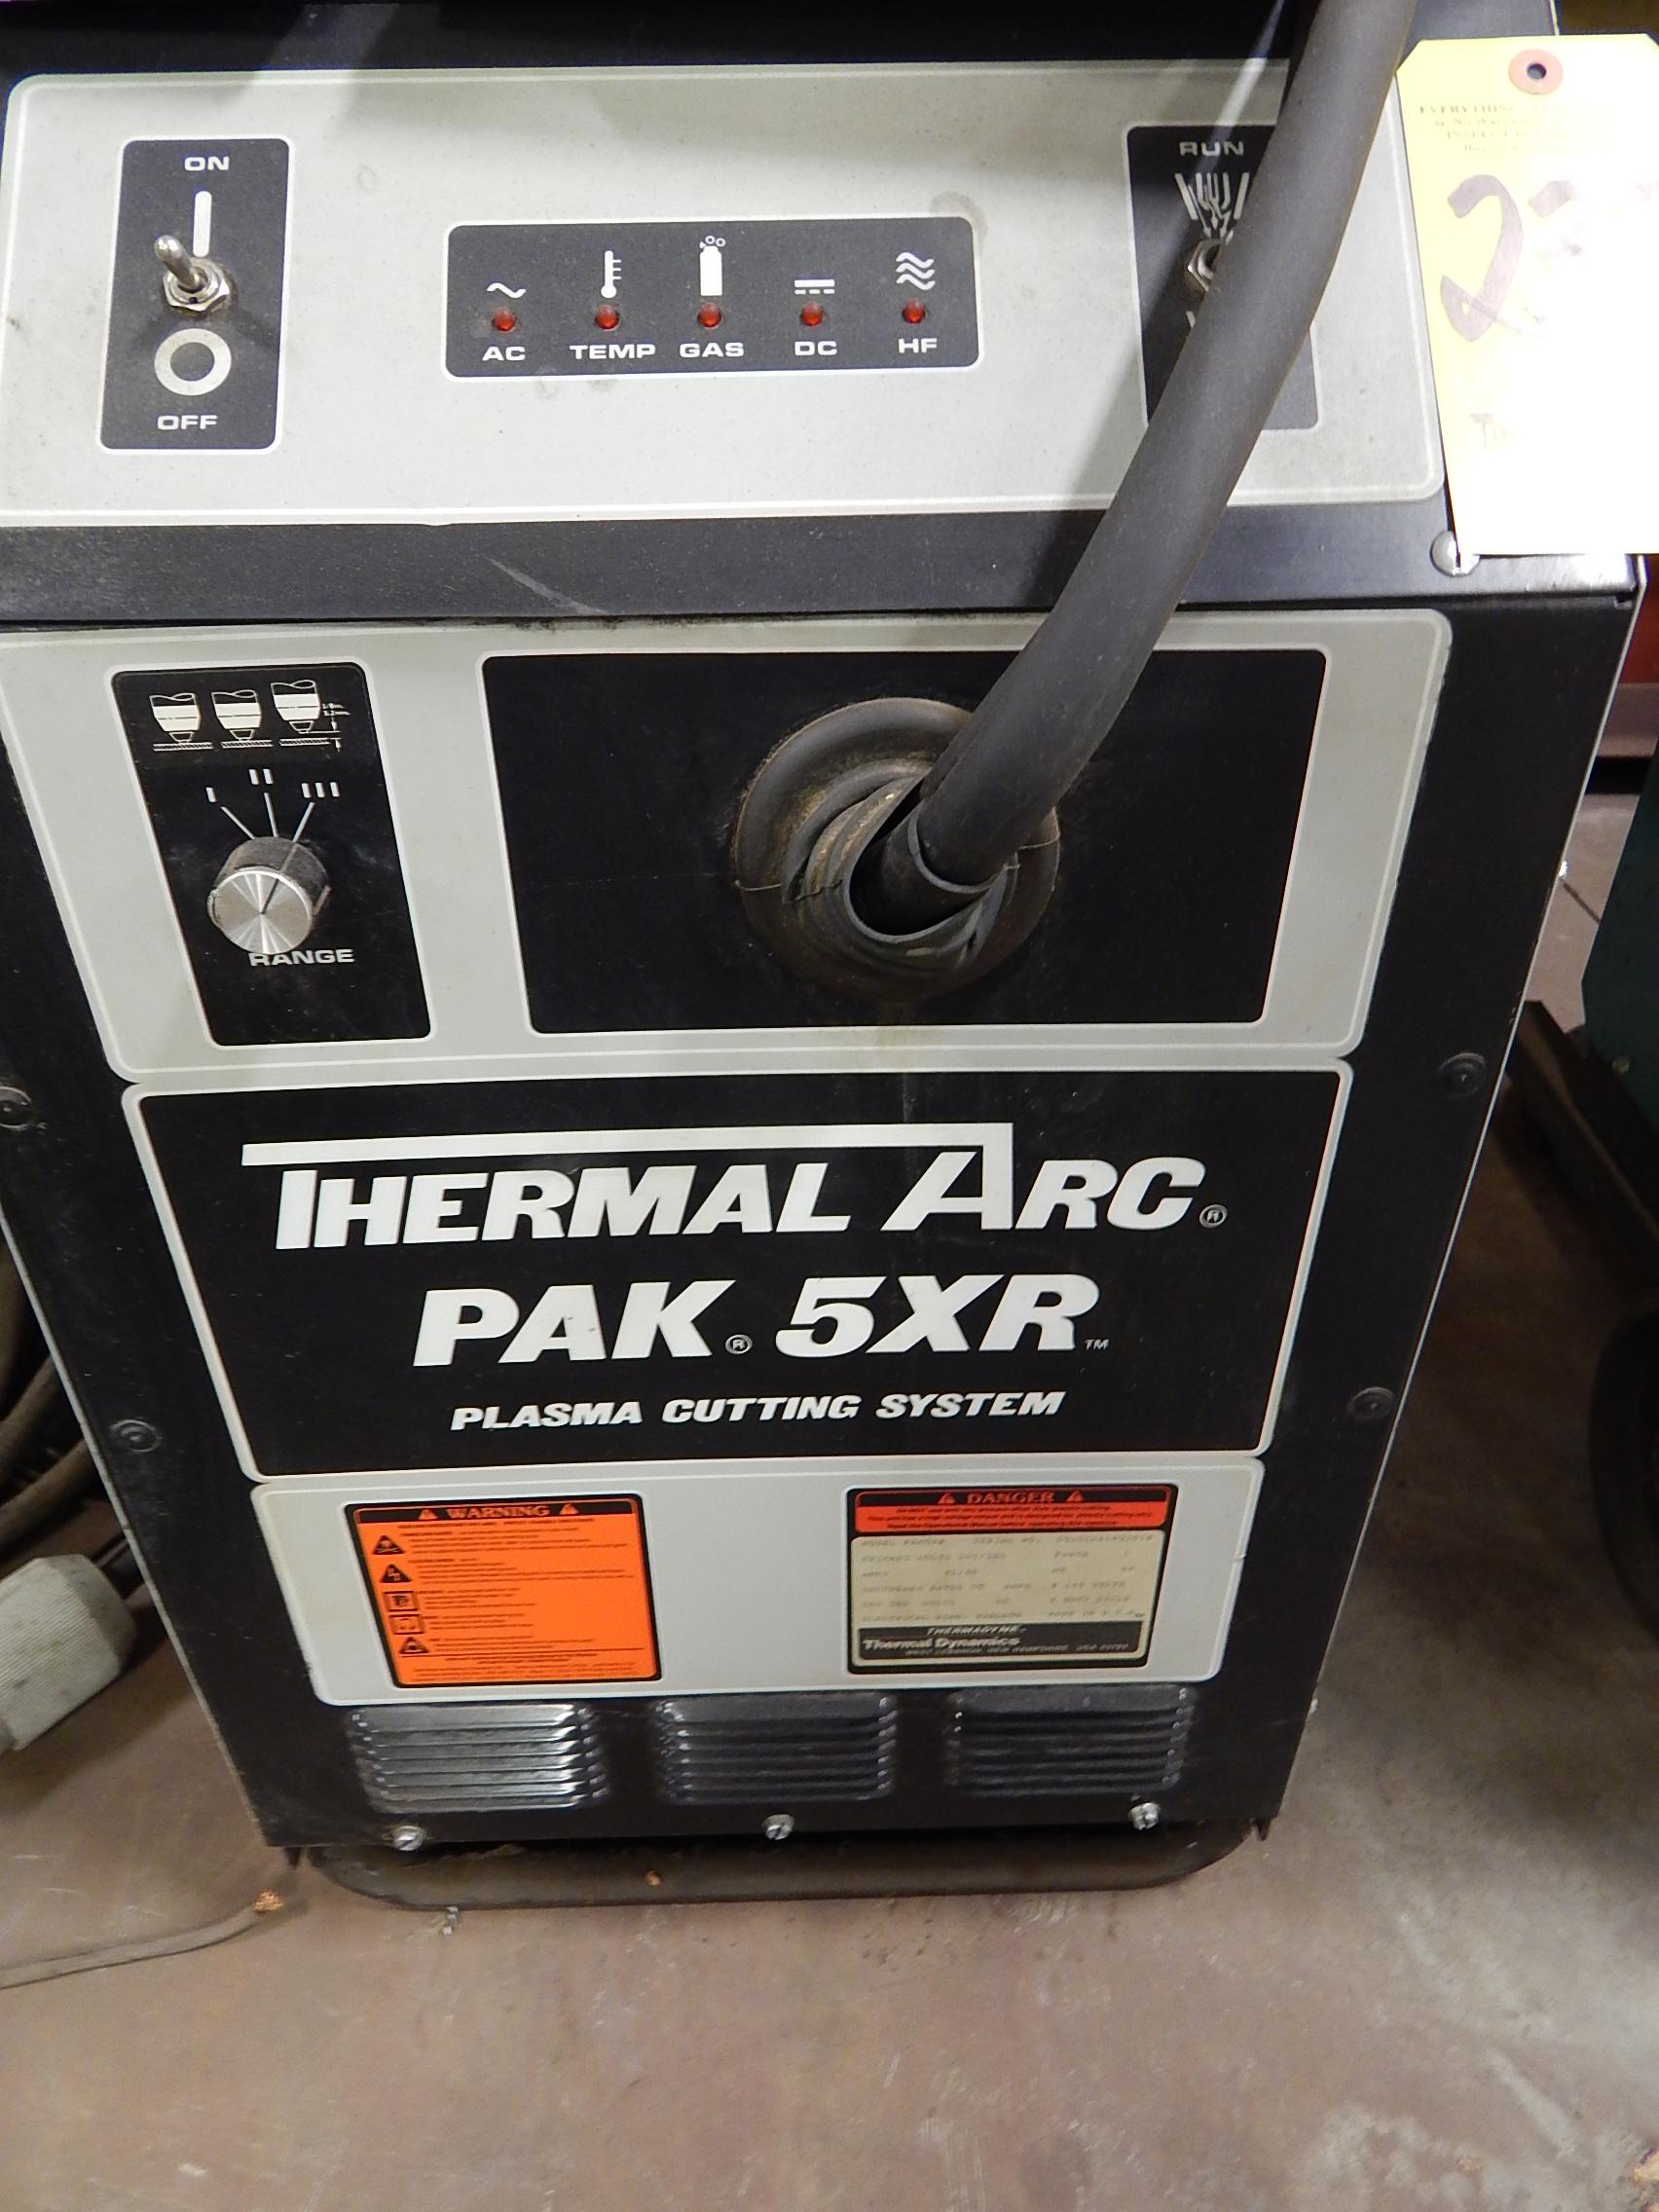 Thermal Dynamics Pak 5xr Manual